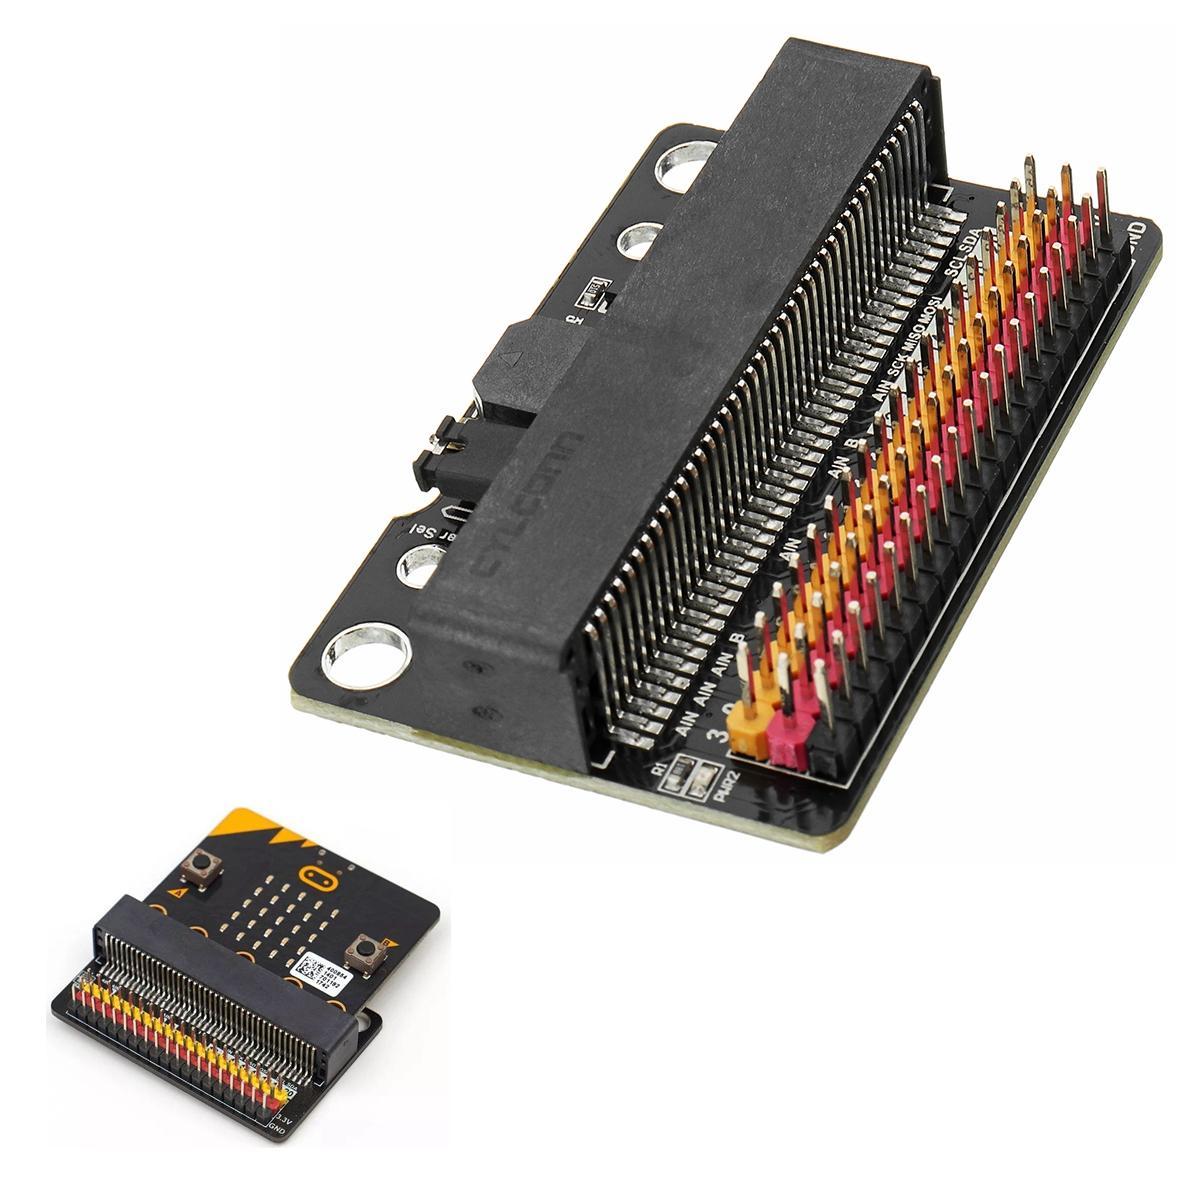 IOBIT Expansion Board Breakout Adapter Board For BBC Micro: bit Development Module Contains Buzzer